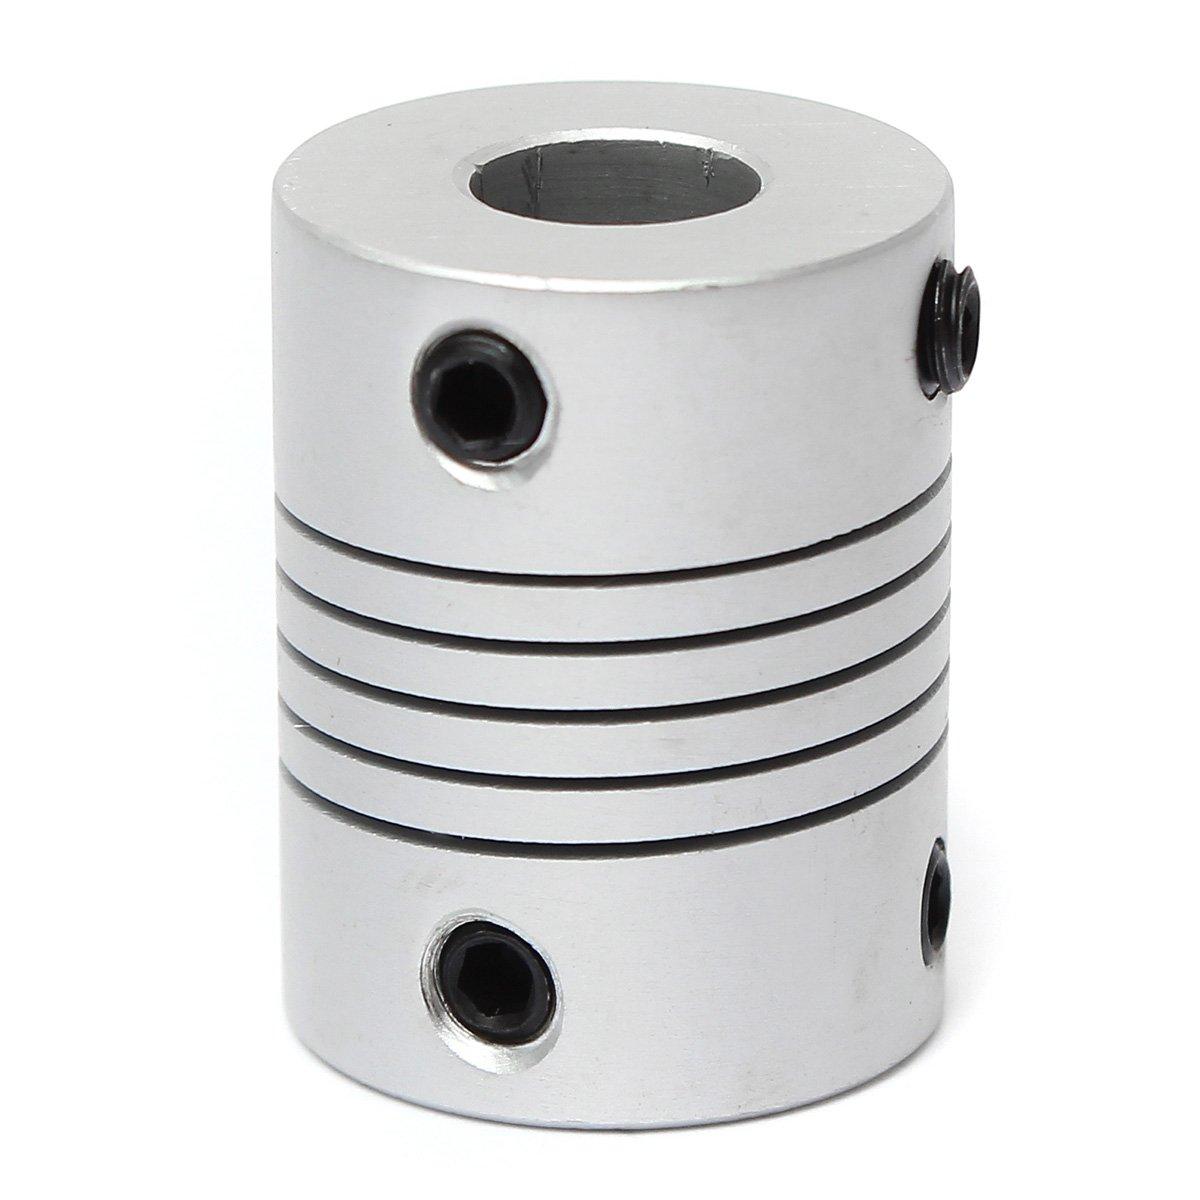 ChenXi Shop 4 Pieces 4mm x 4mm Aluminum Flexible Shaft Coupling OD19mm x L25mm CNC Stepper Motor Coupler Connector